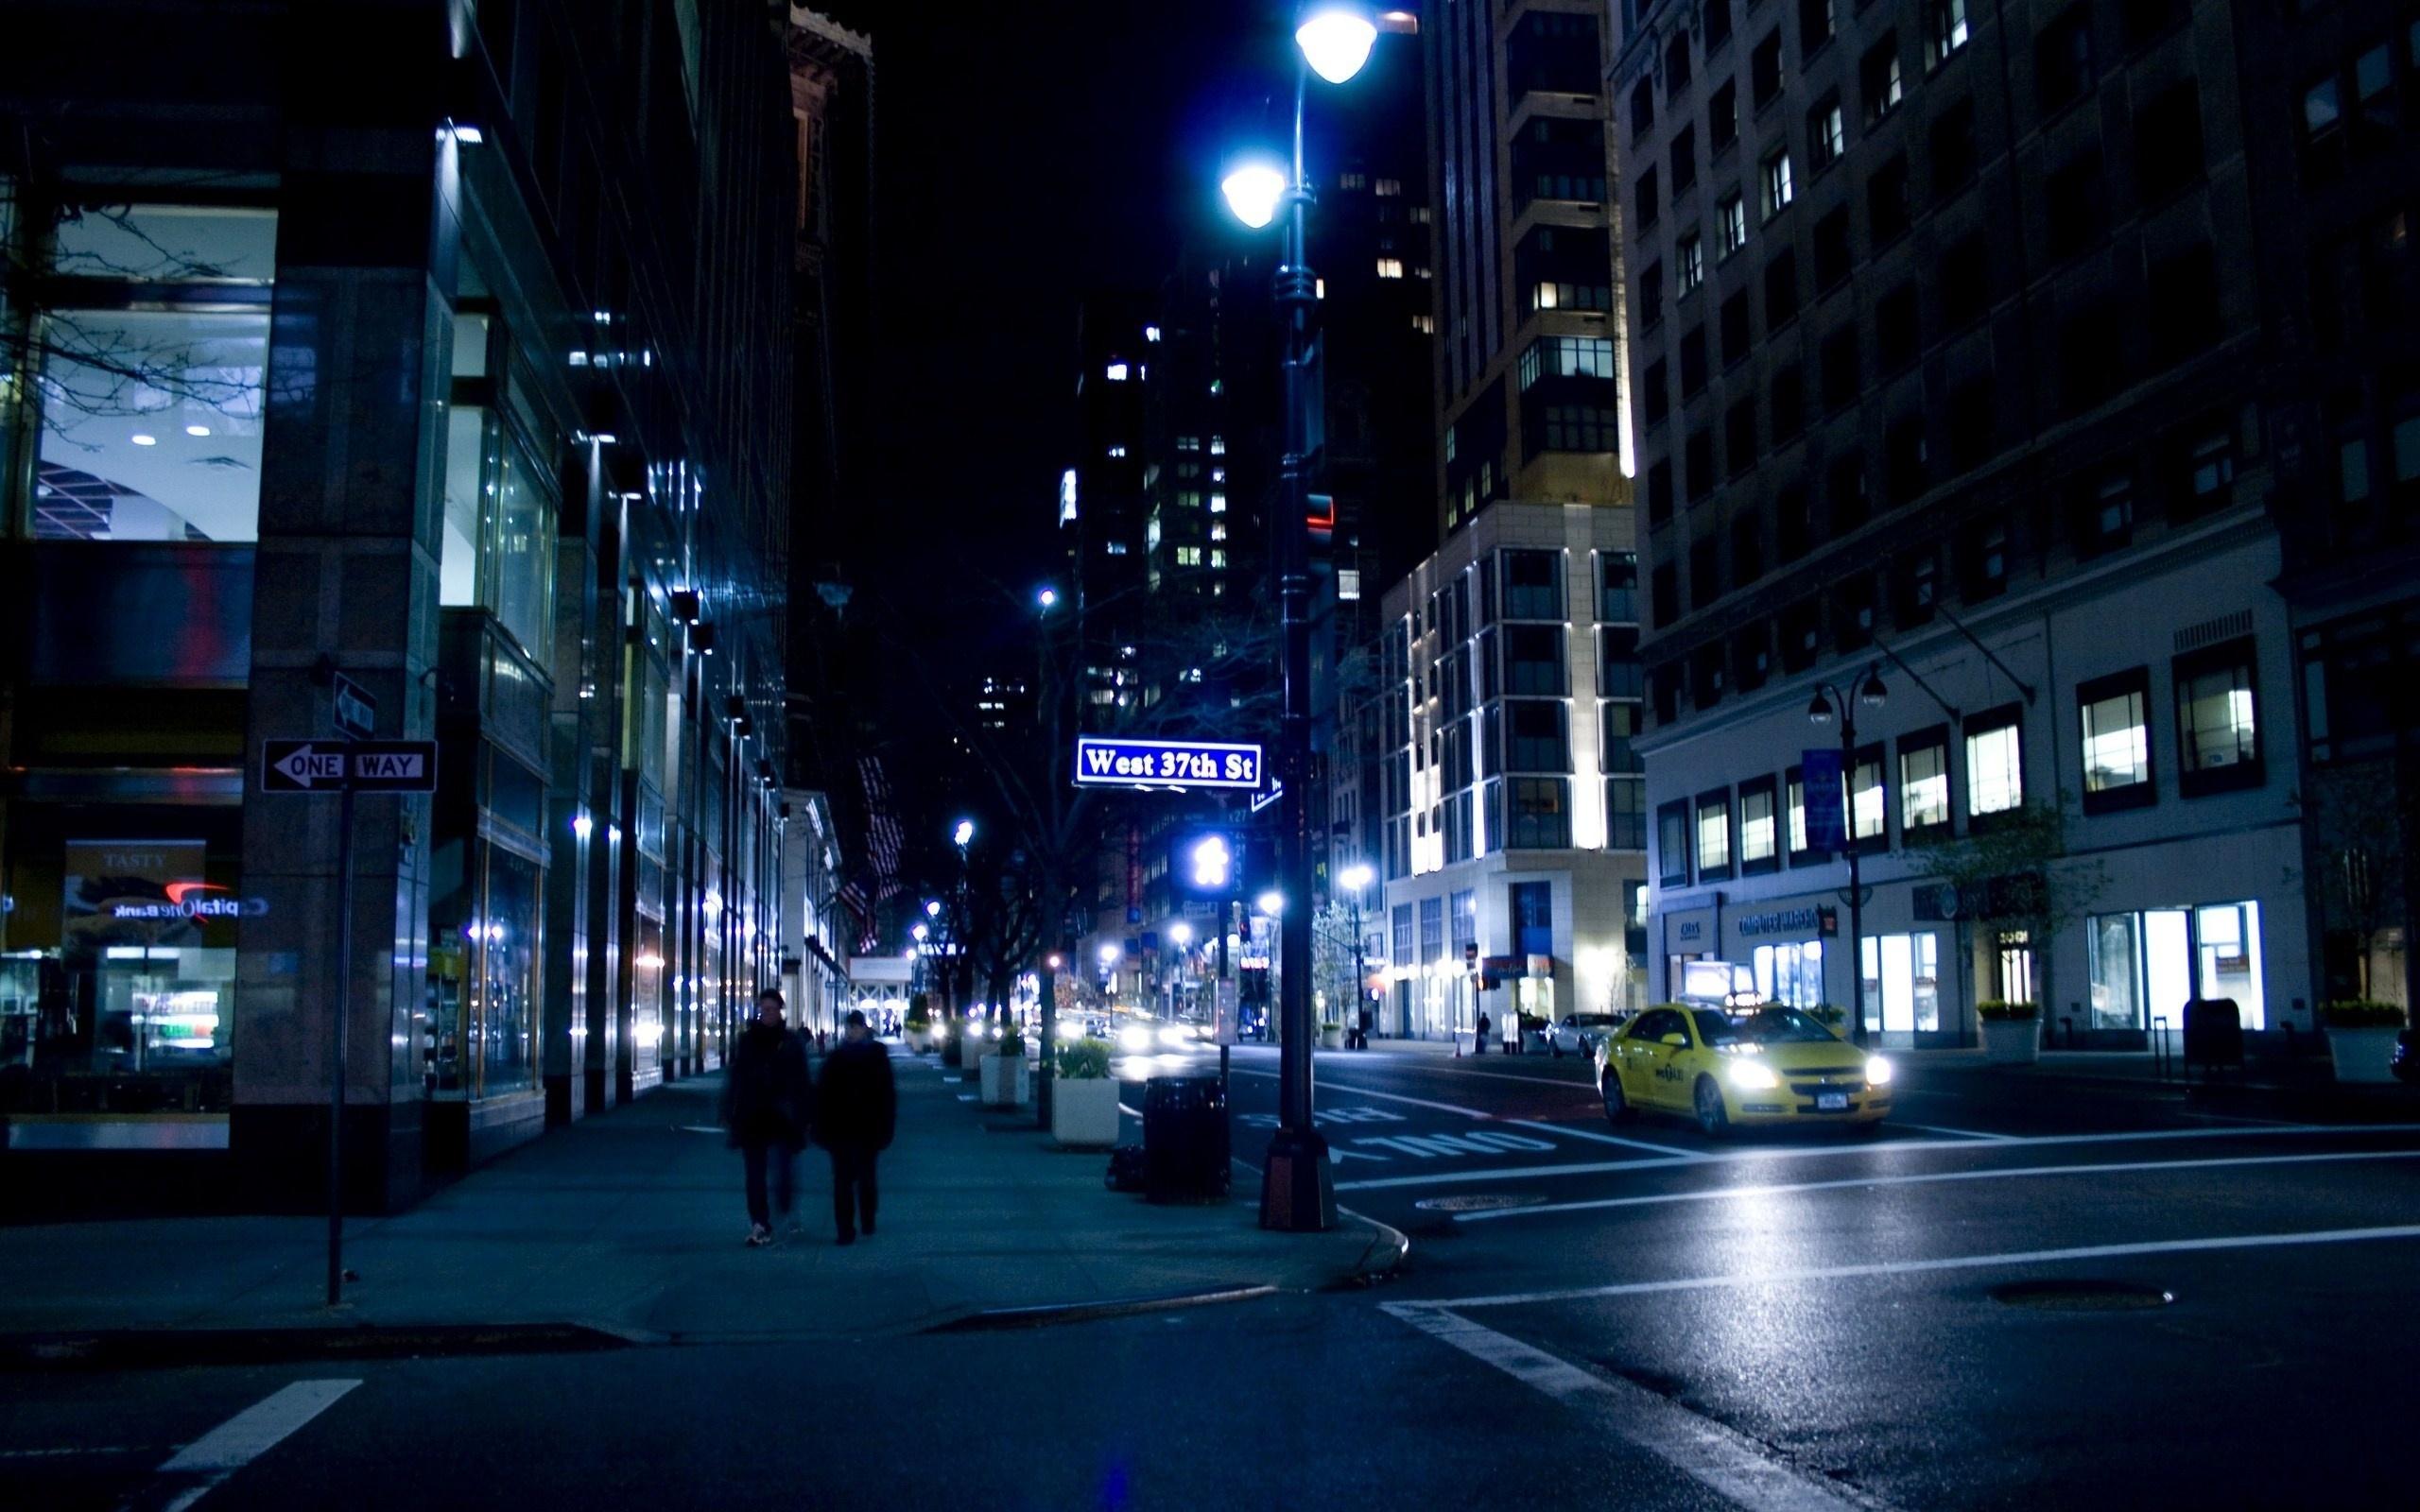 wallpaper street light city cityscape night reflection road